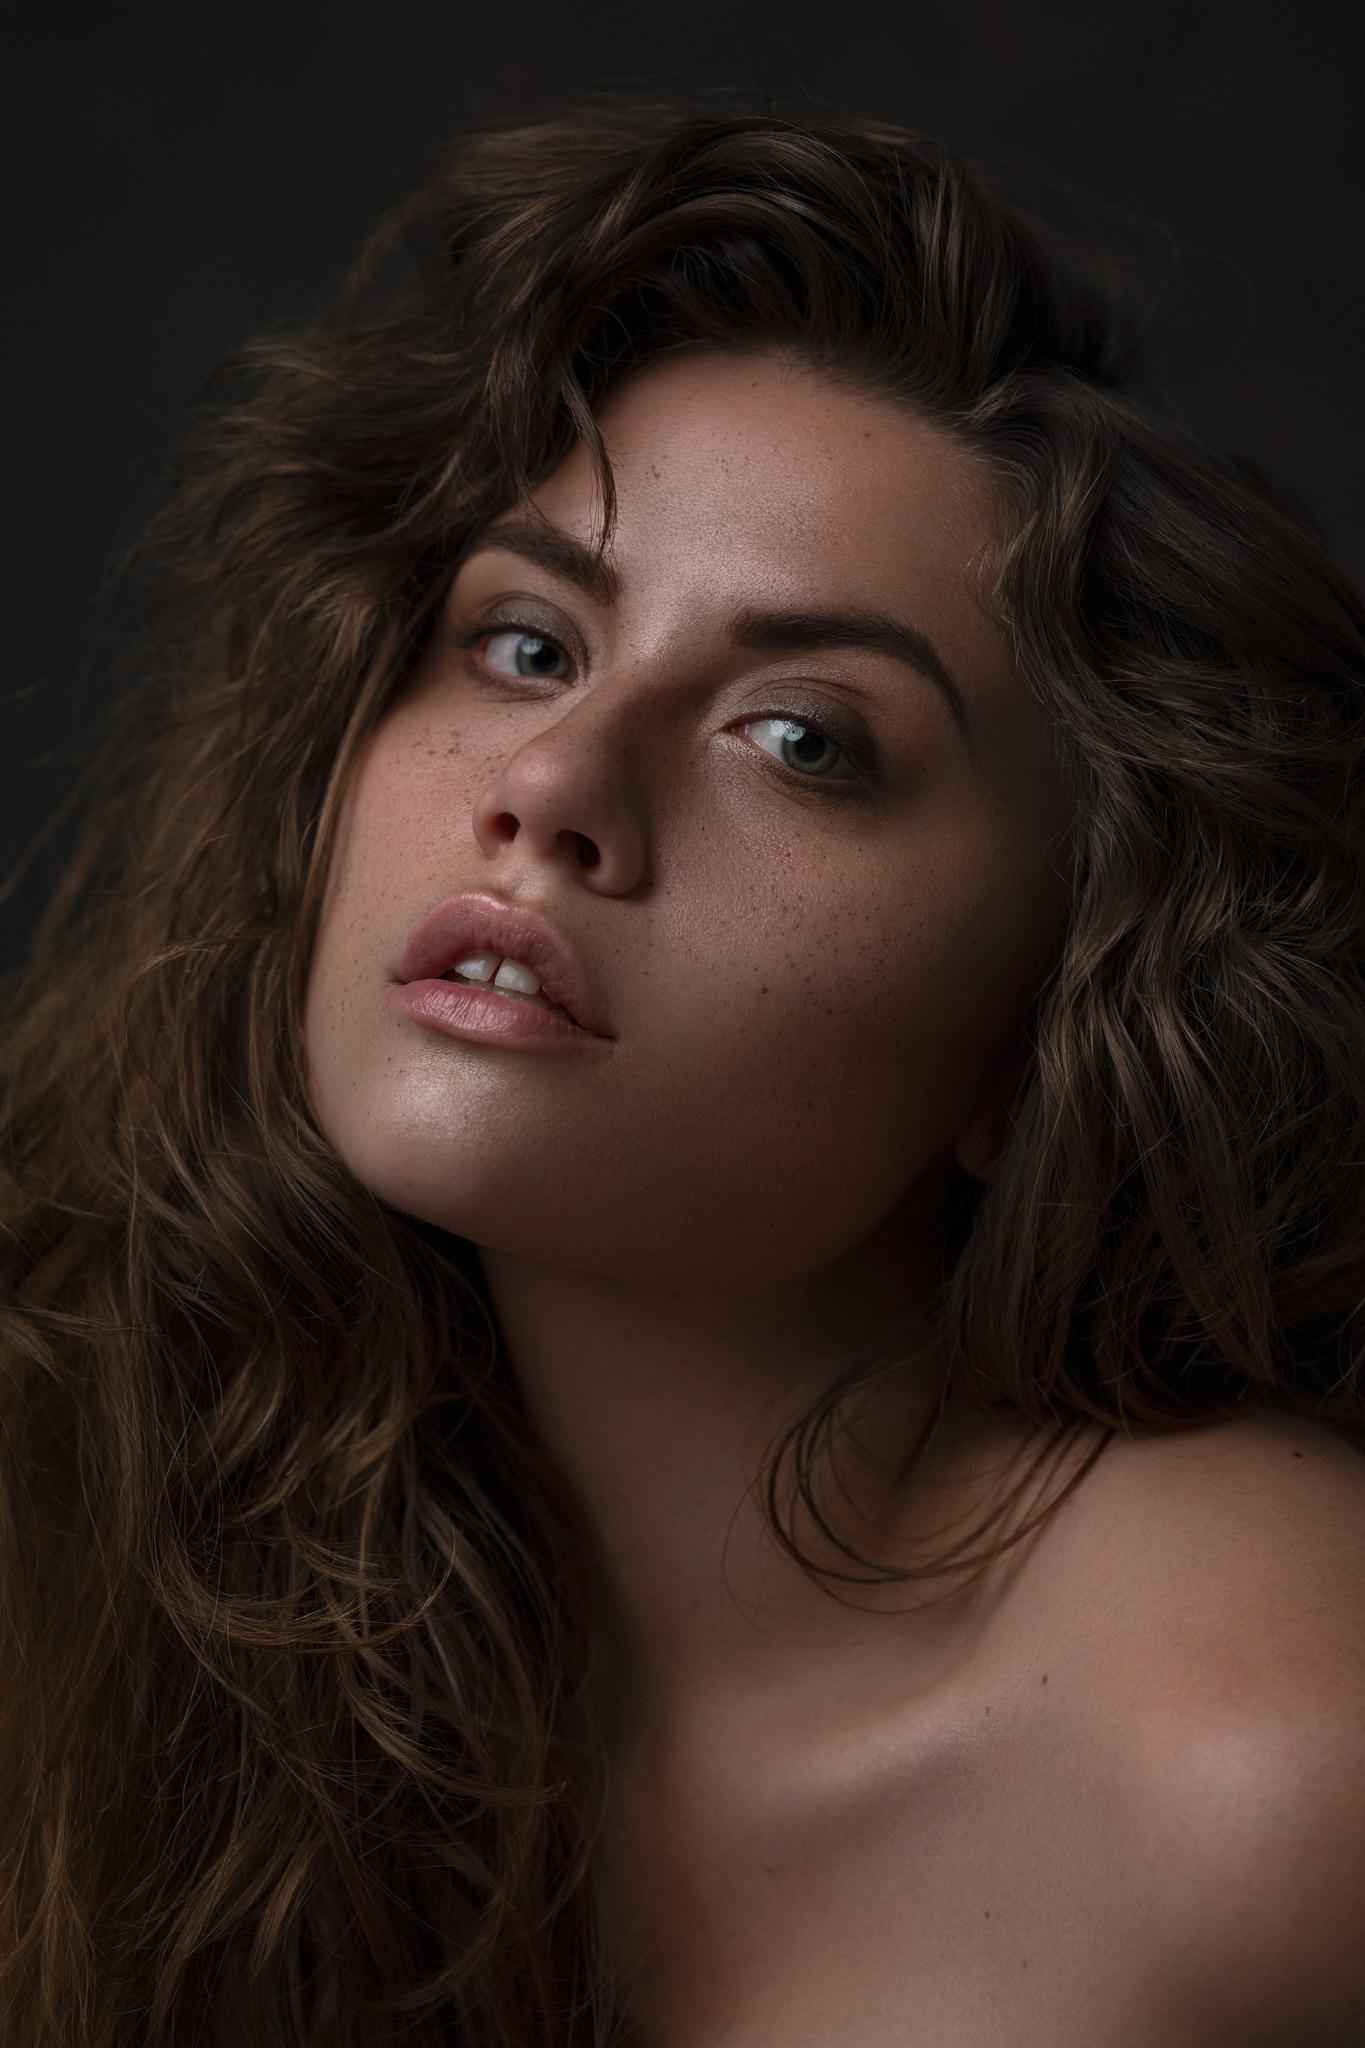 Photographer: Jessica Wikström  Retouch Artist: Maja Swiderska  Makeup Artist: Maria Frorer Model: Sara Semb